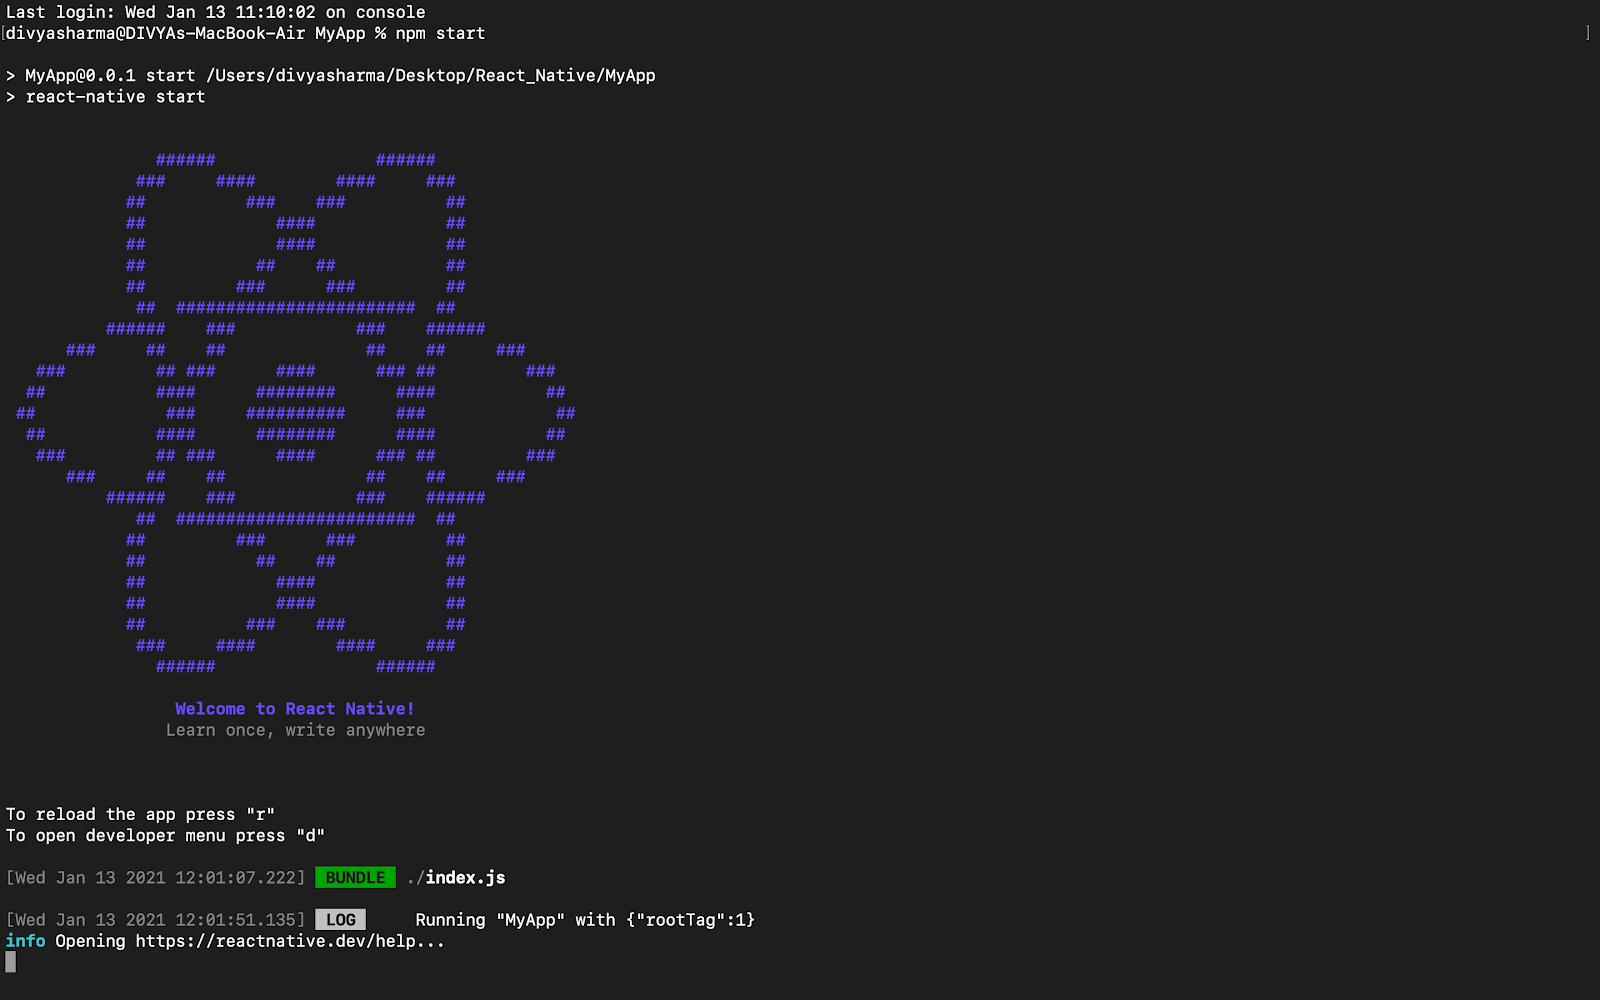 Run the server npm start